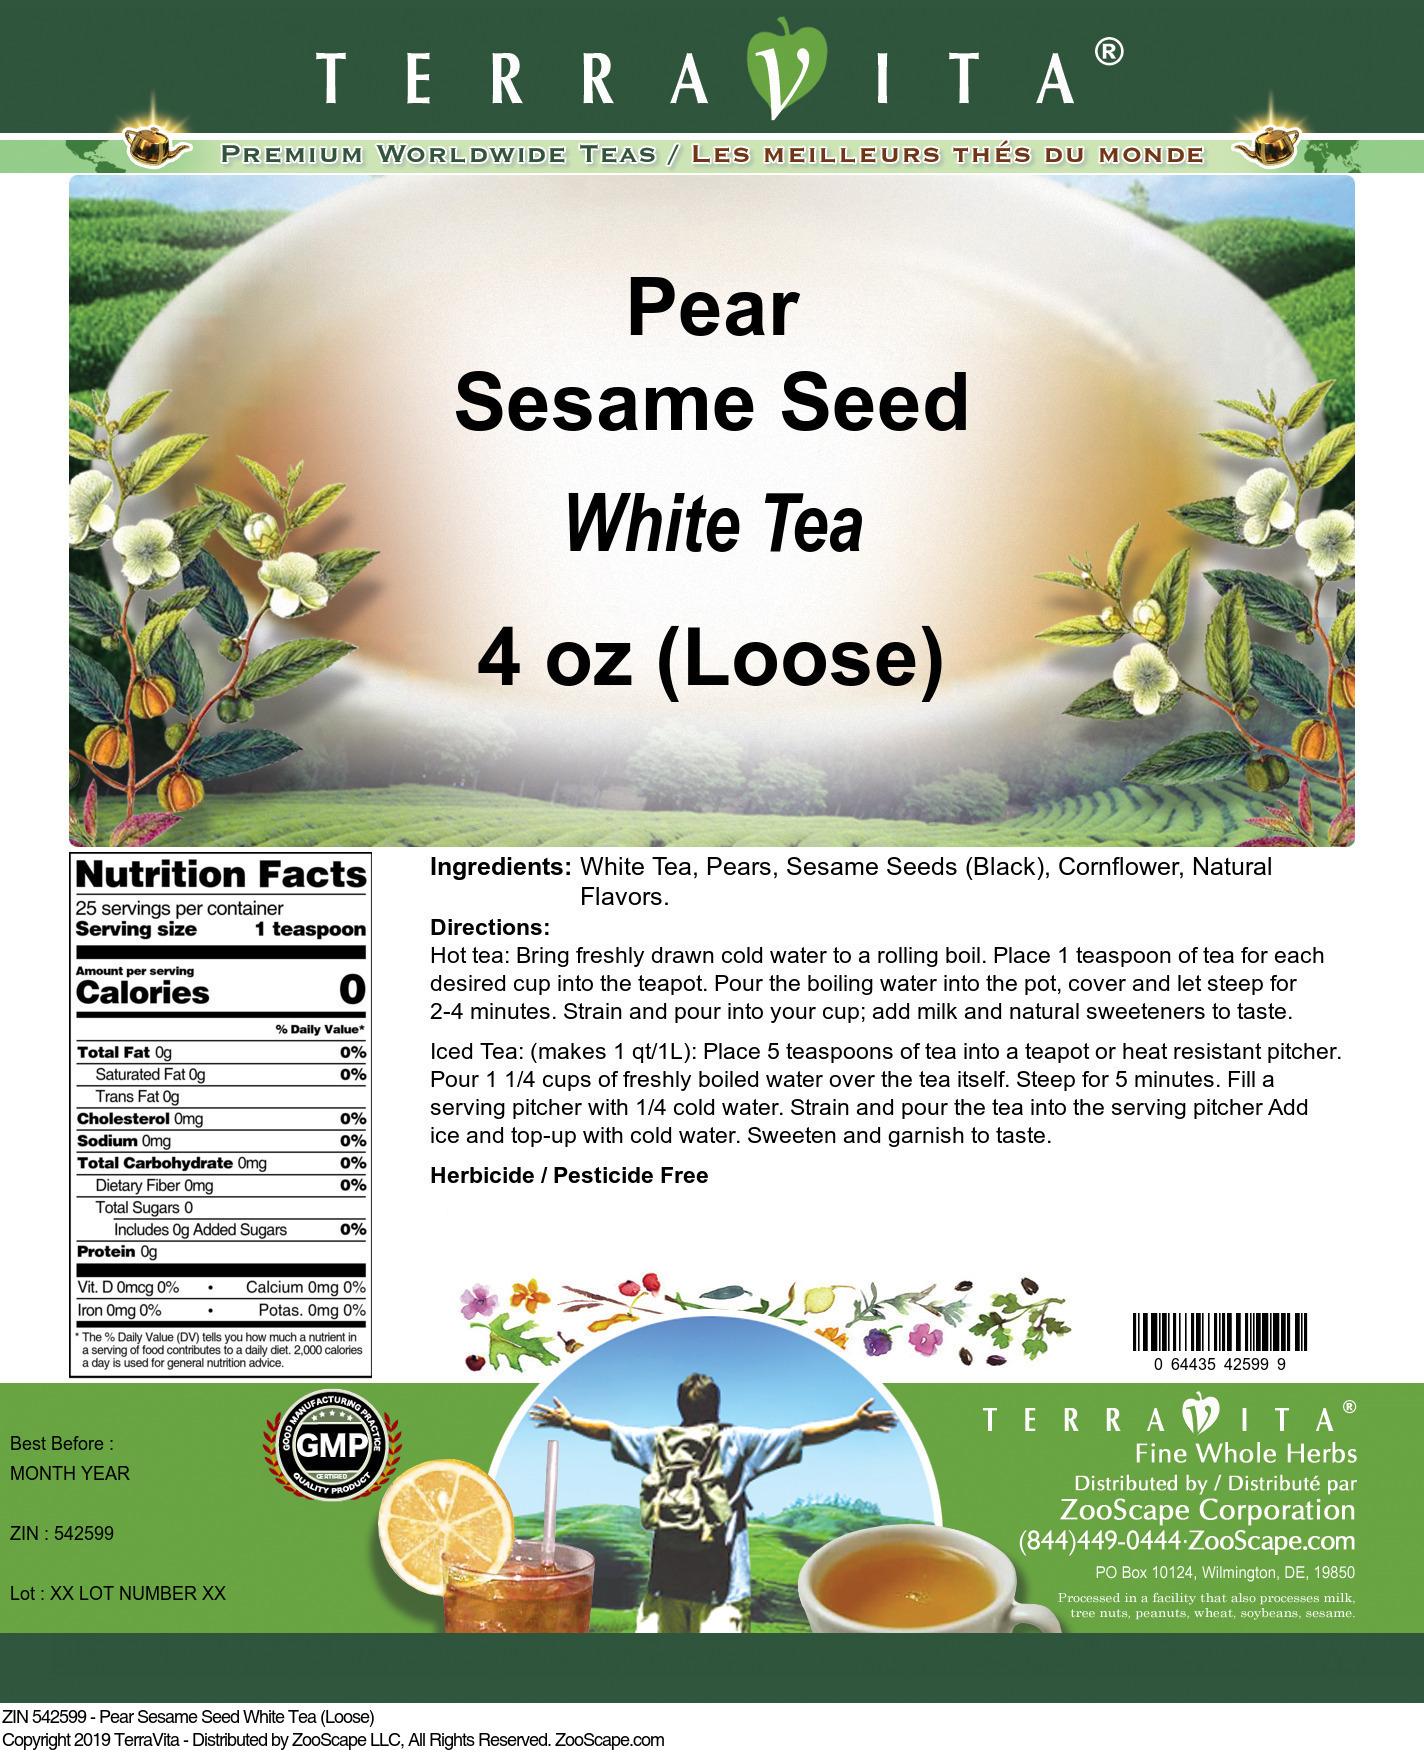 Pear Sesame Seed White Tea